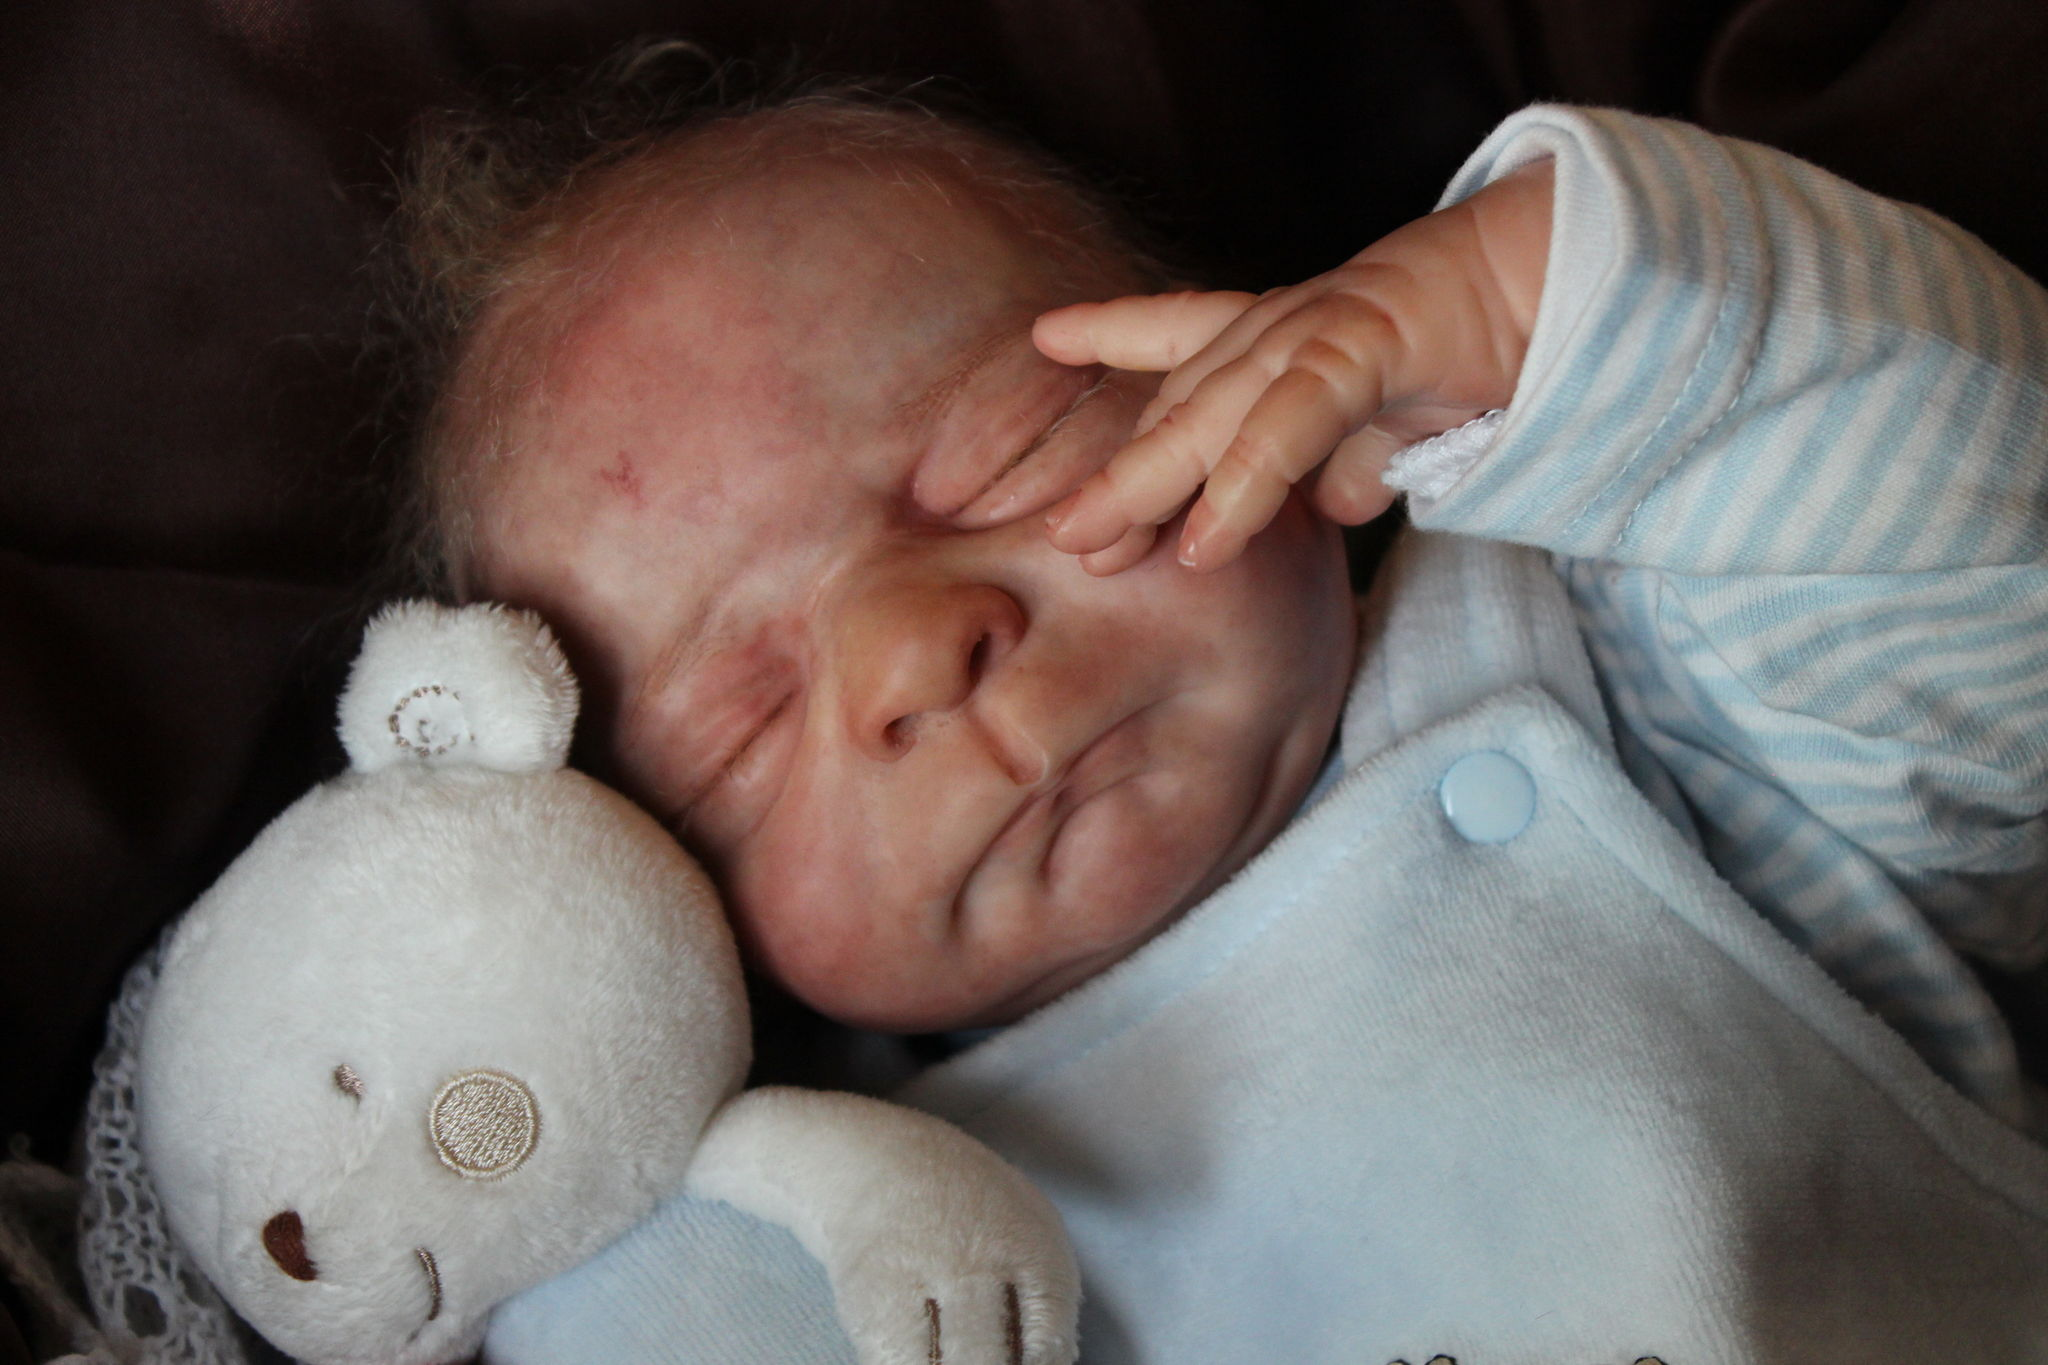 bébé reborn février 2013 France 2 + Valentin 064